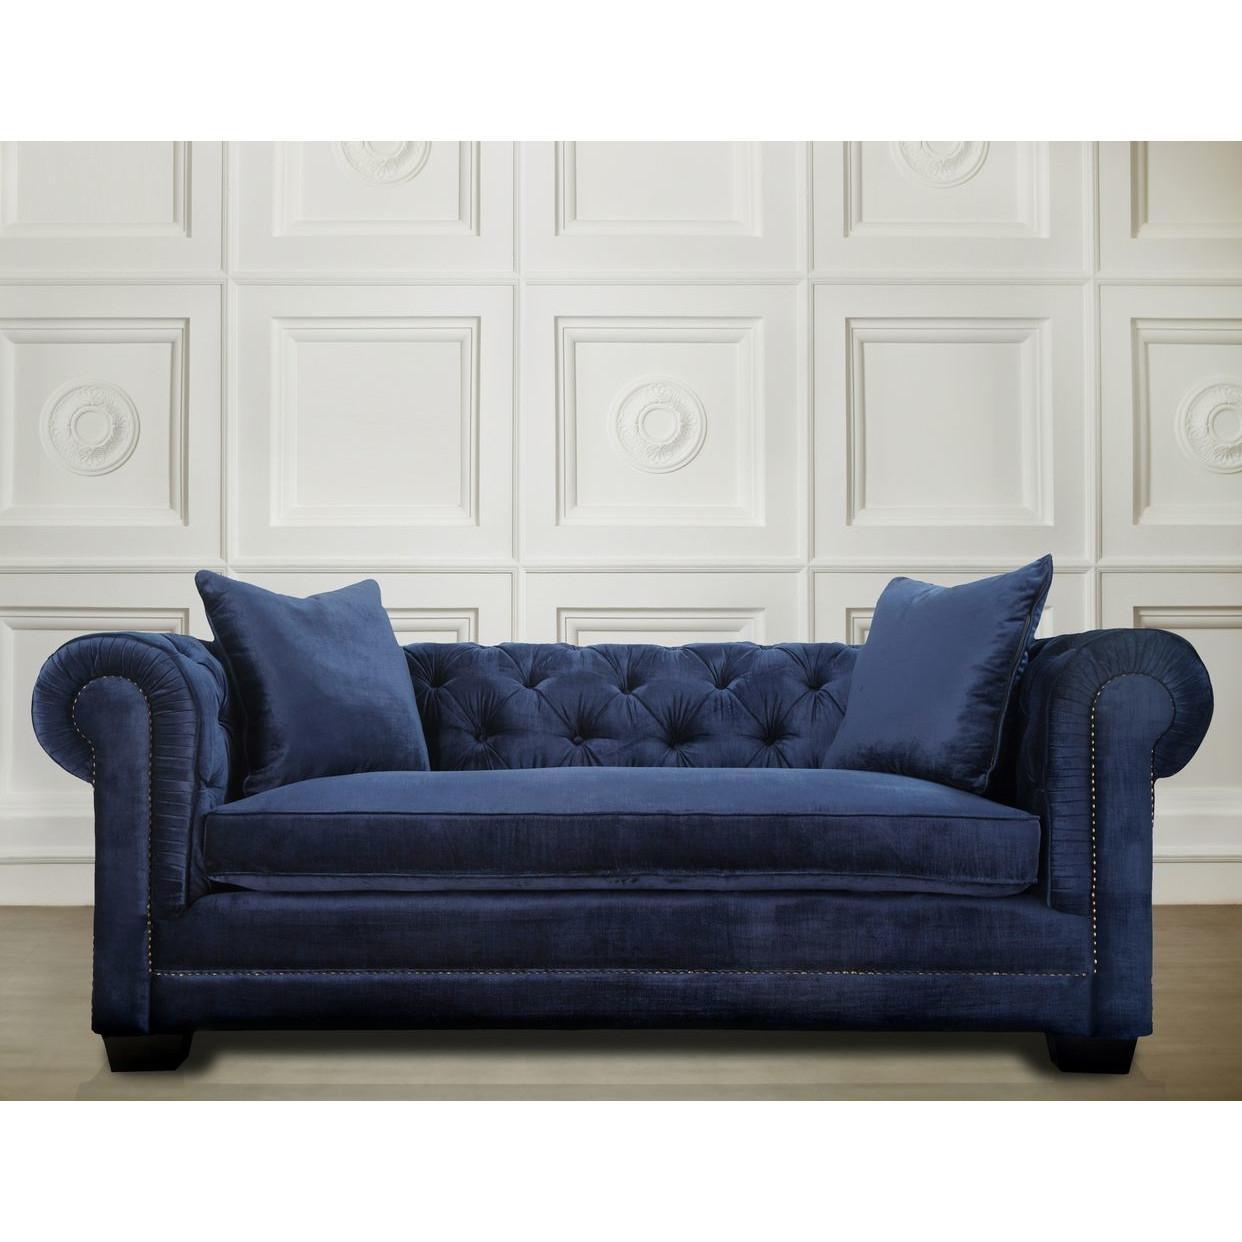 Broyhill Reclining Sofa Images Sofas Cassandra